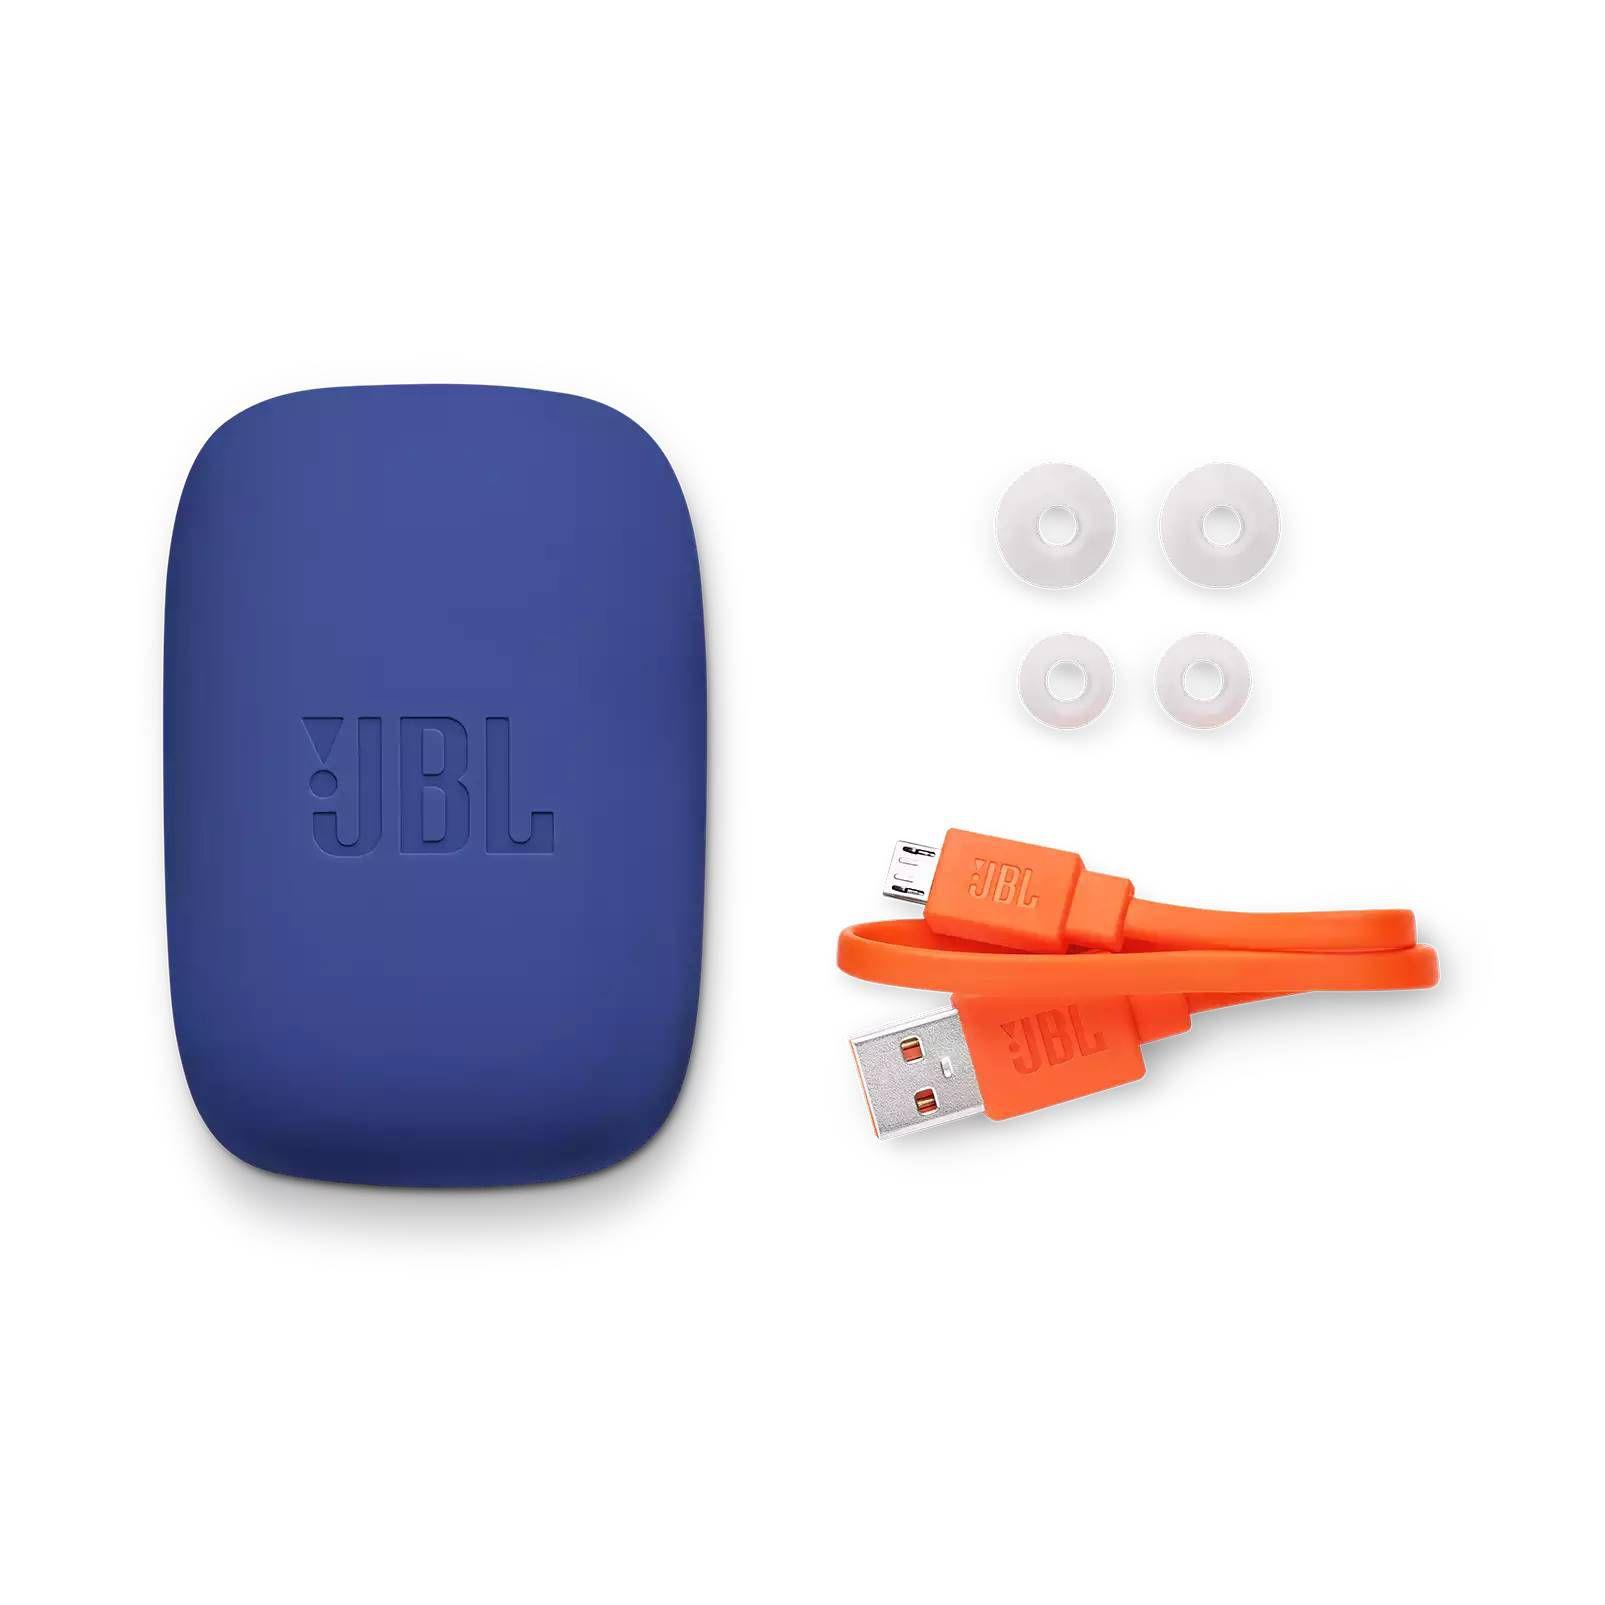 Fone de Ouvido Bluetooth JBL Endurance Jump - Azul e Branco JBLENDURJUMPBLU